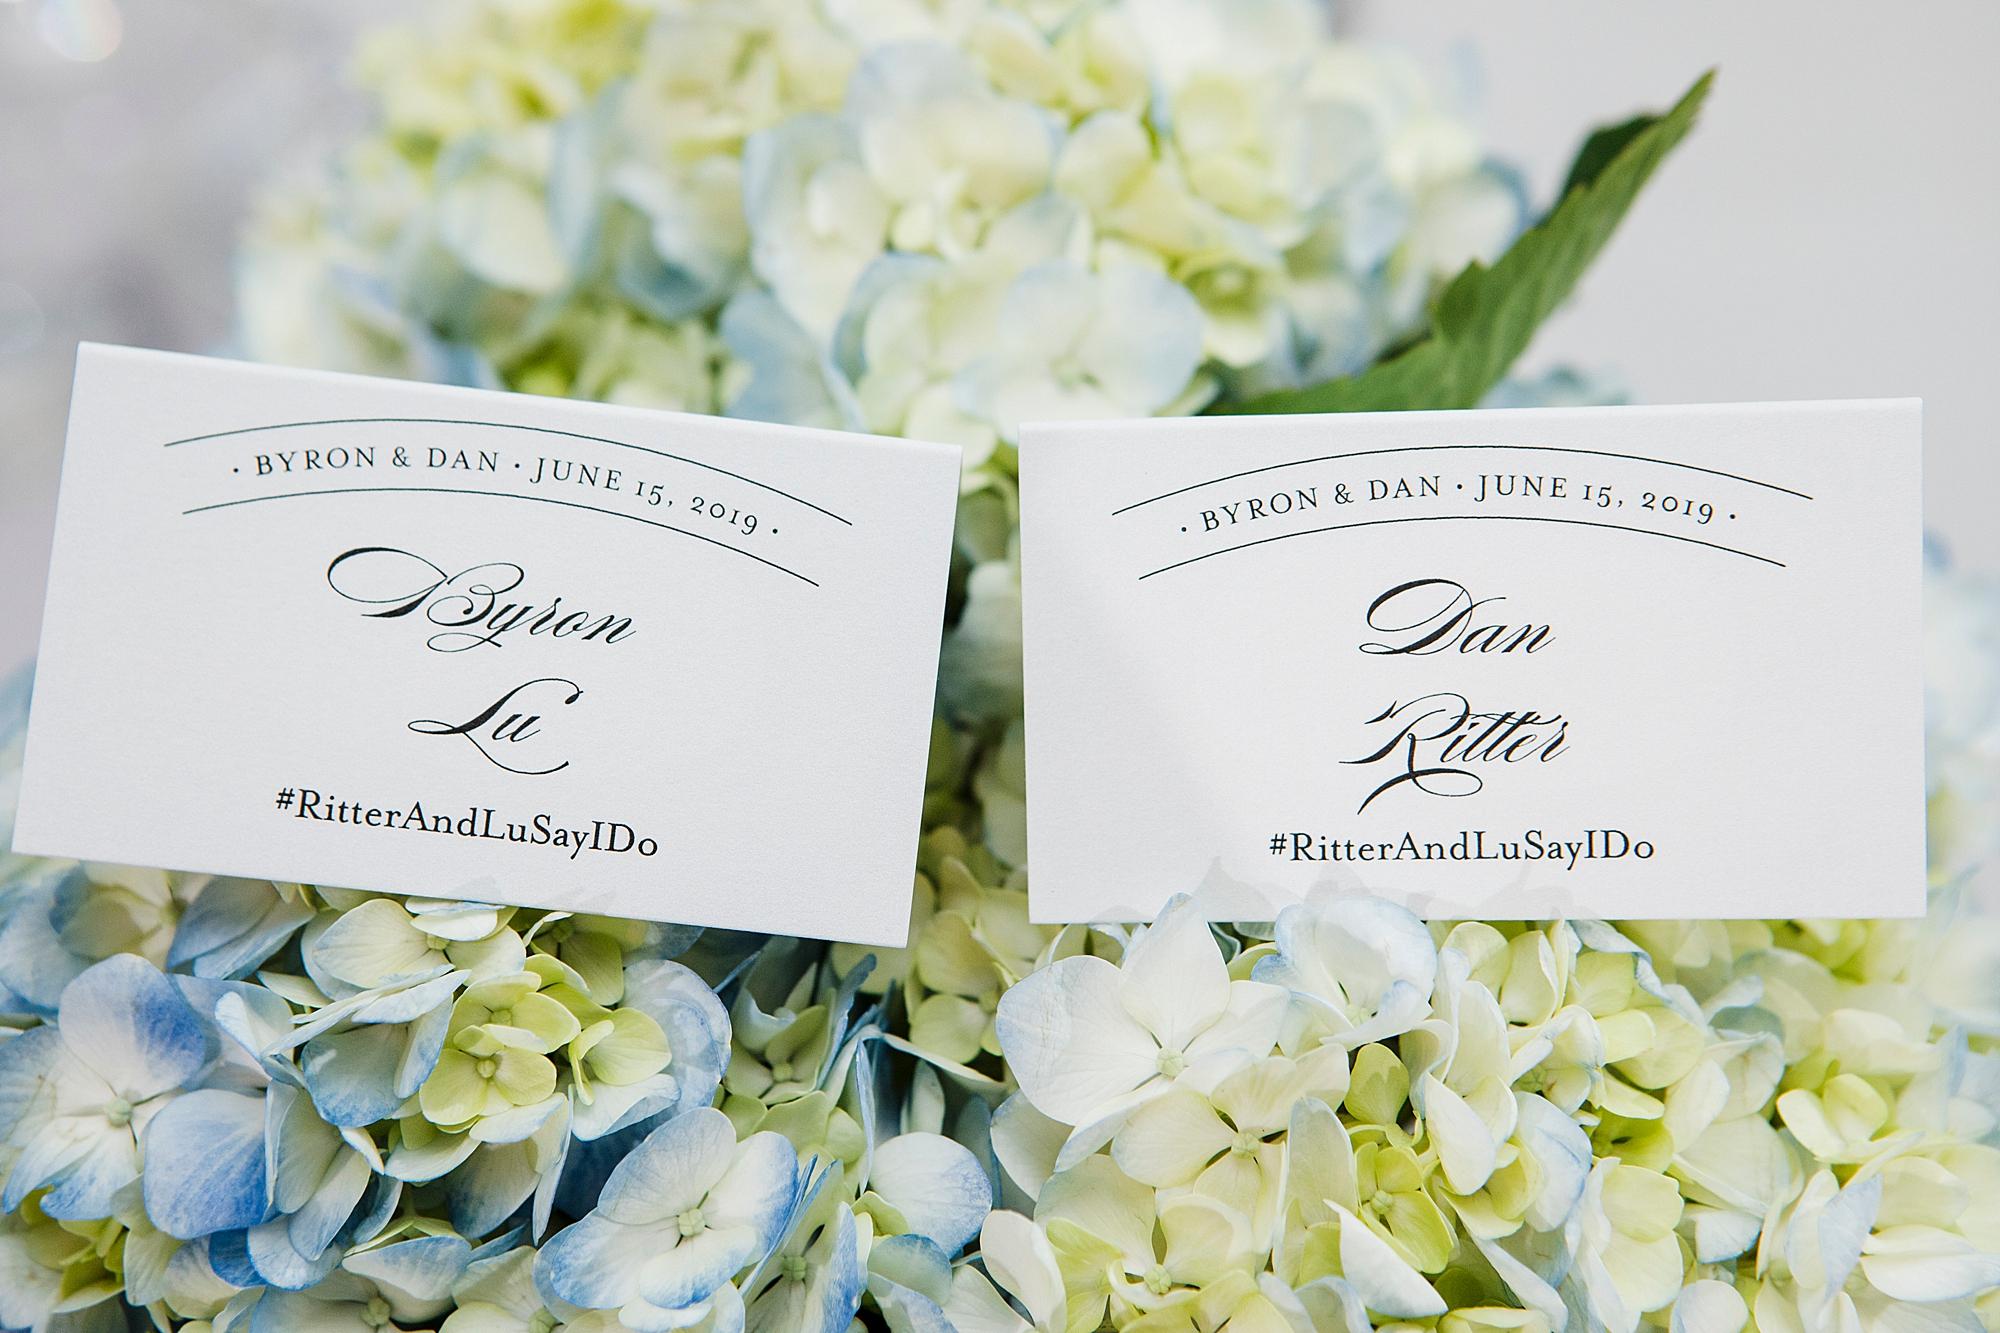 Dan_and_Byron_Love_by_Joe_Mac_Philadelphia_Wedding_LGBTQ_Photography_Gay_Independence_visitor_Center_121.JPG